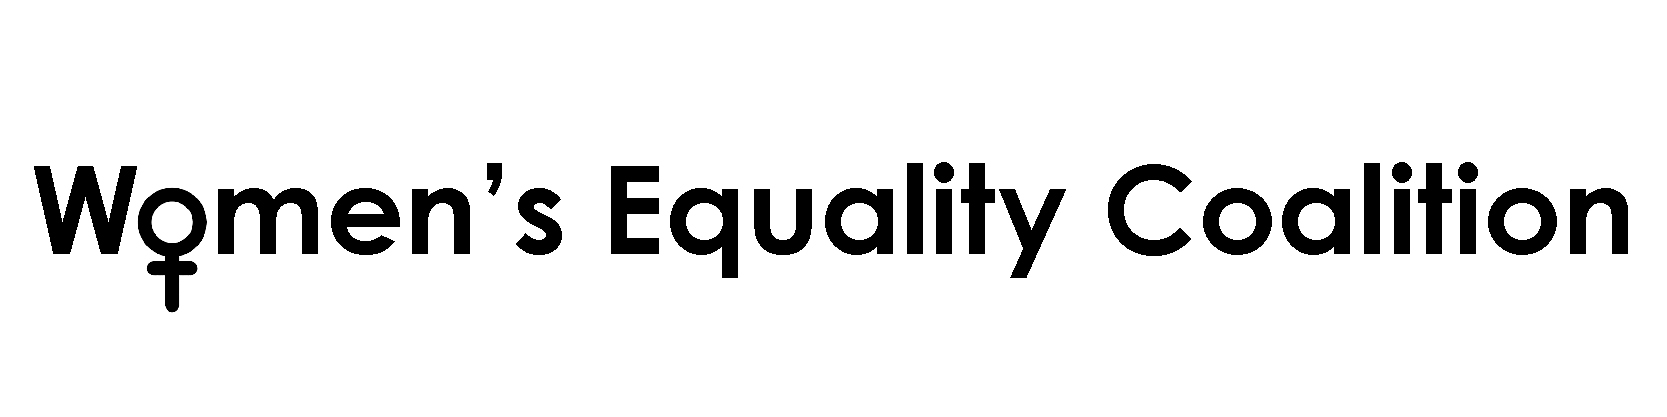 Women's Equality Agenda